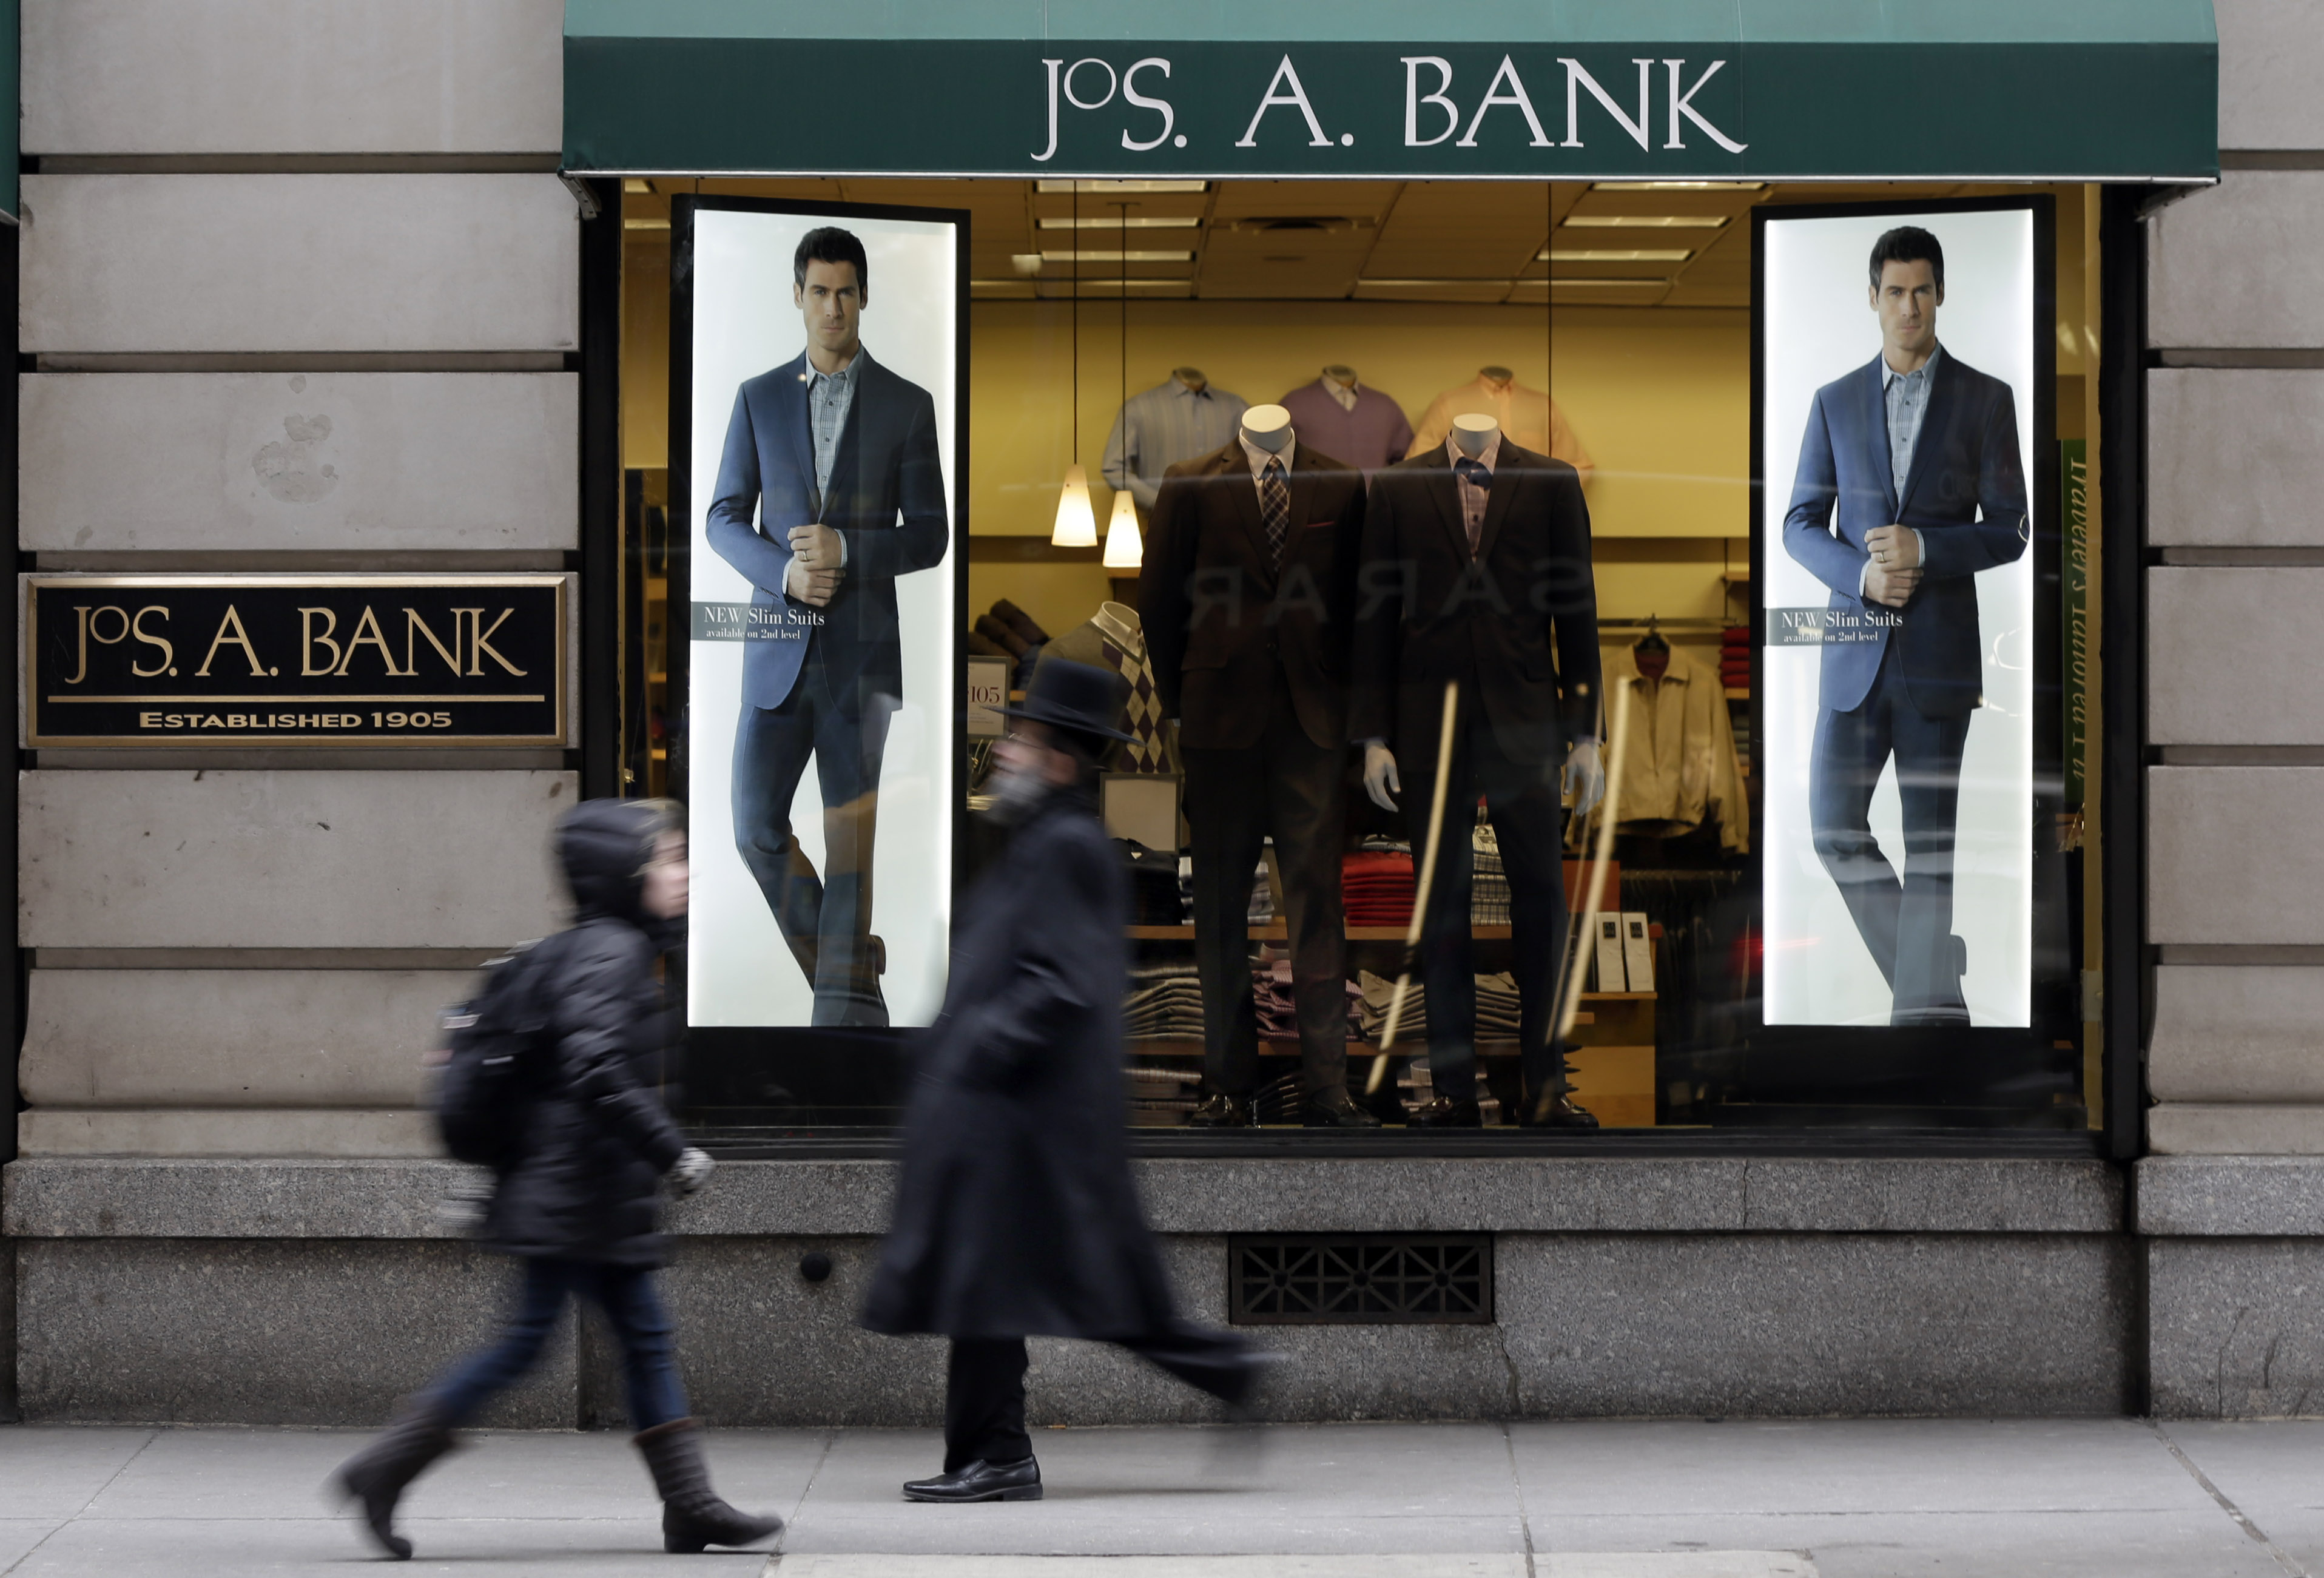 Men's Wearhouse Jos A Bank